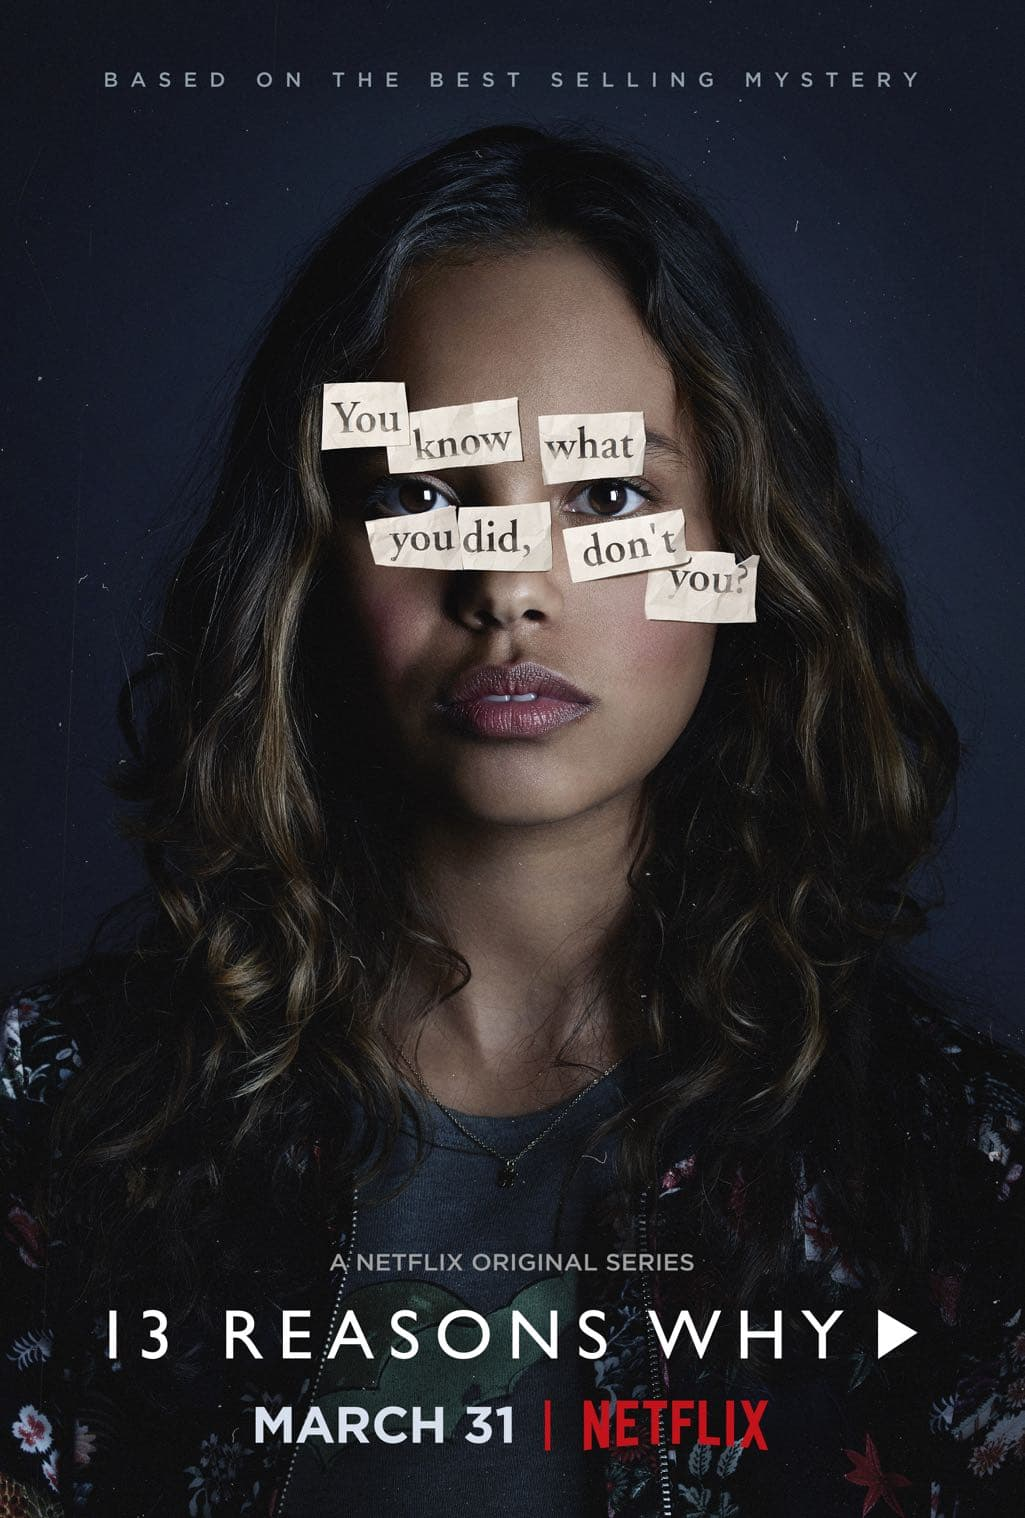 13 Reasons Why Character Poster Alisha Boe as Jessica Davis